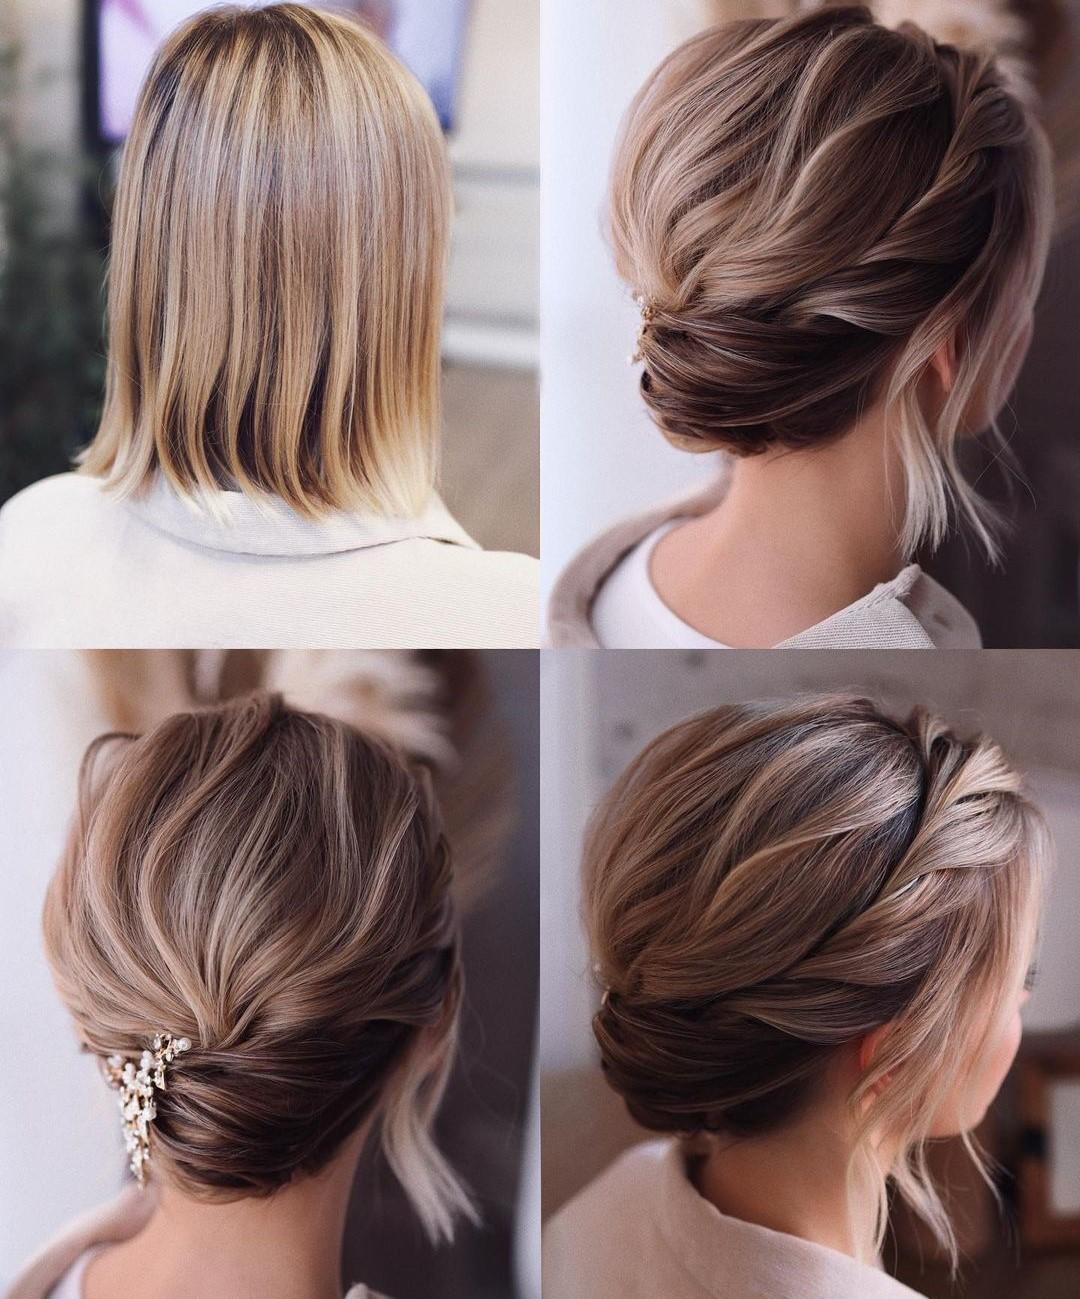 Simple Wedding Updo for Short-Length Hair